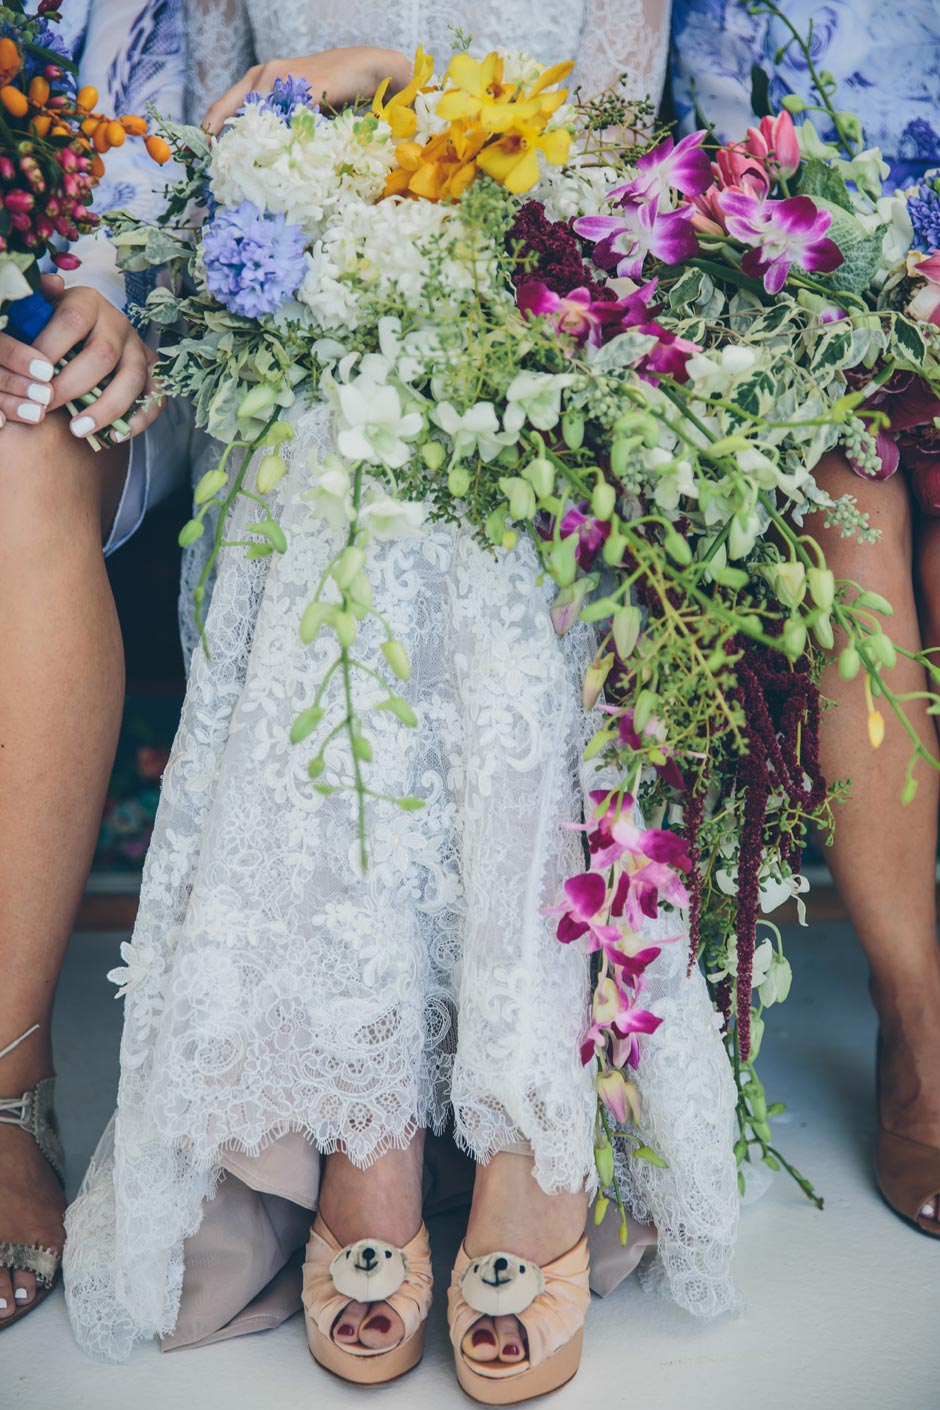 cape-town-wedding-south-africa-east-city-studio-shanna-jones-photography-raphaella-jedd-185